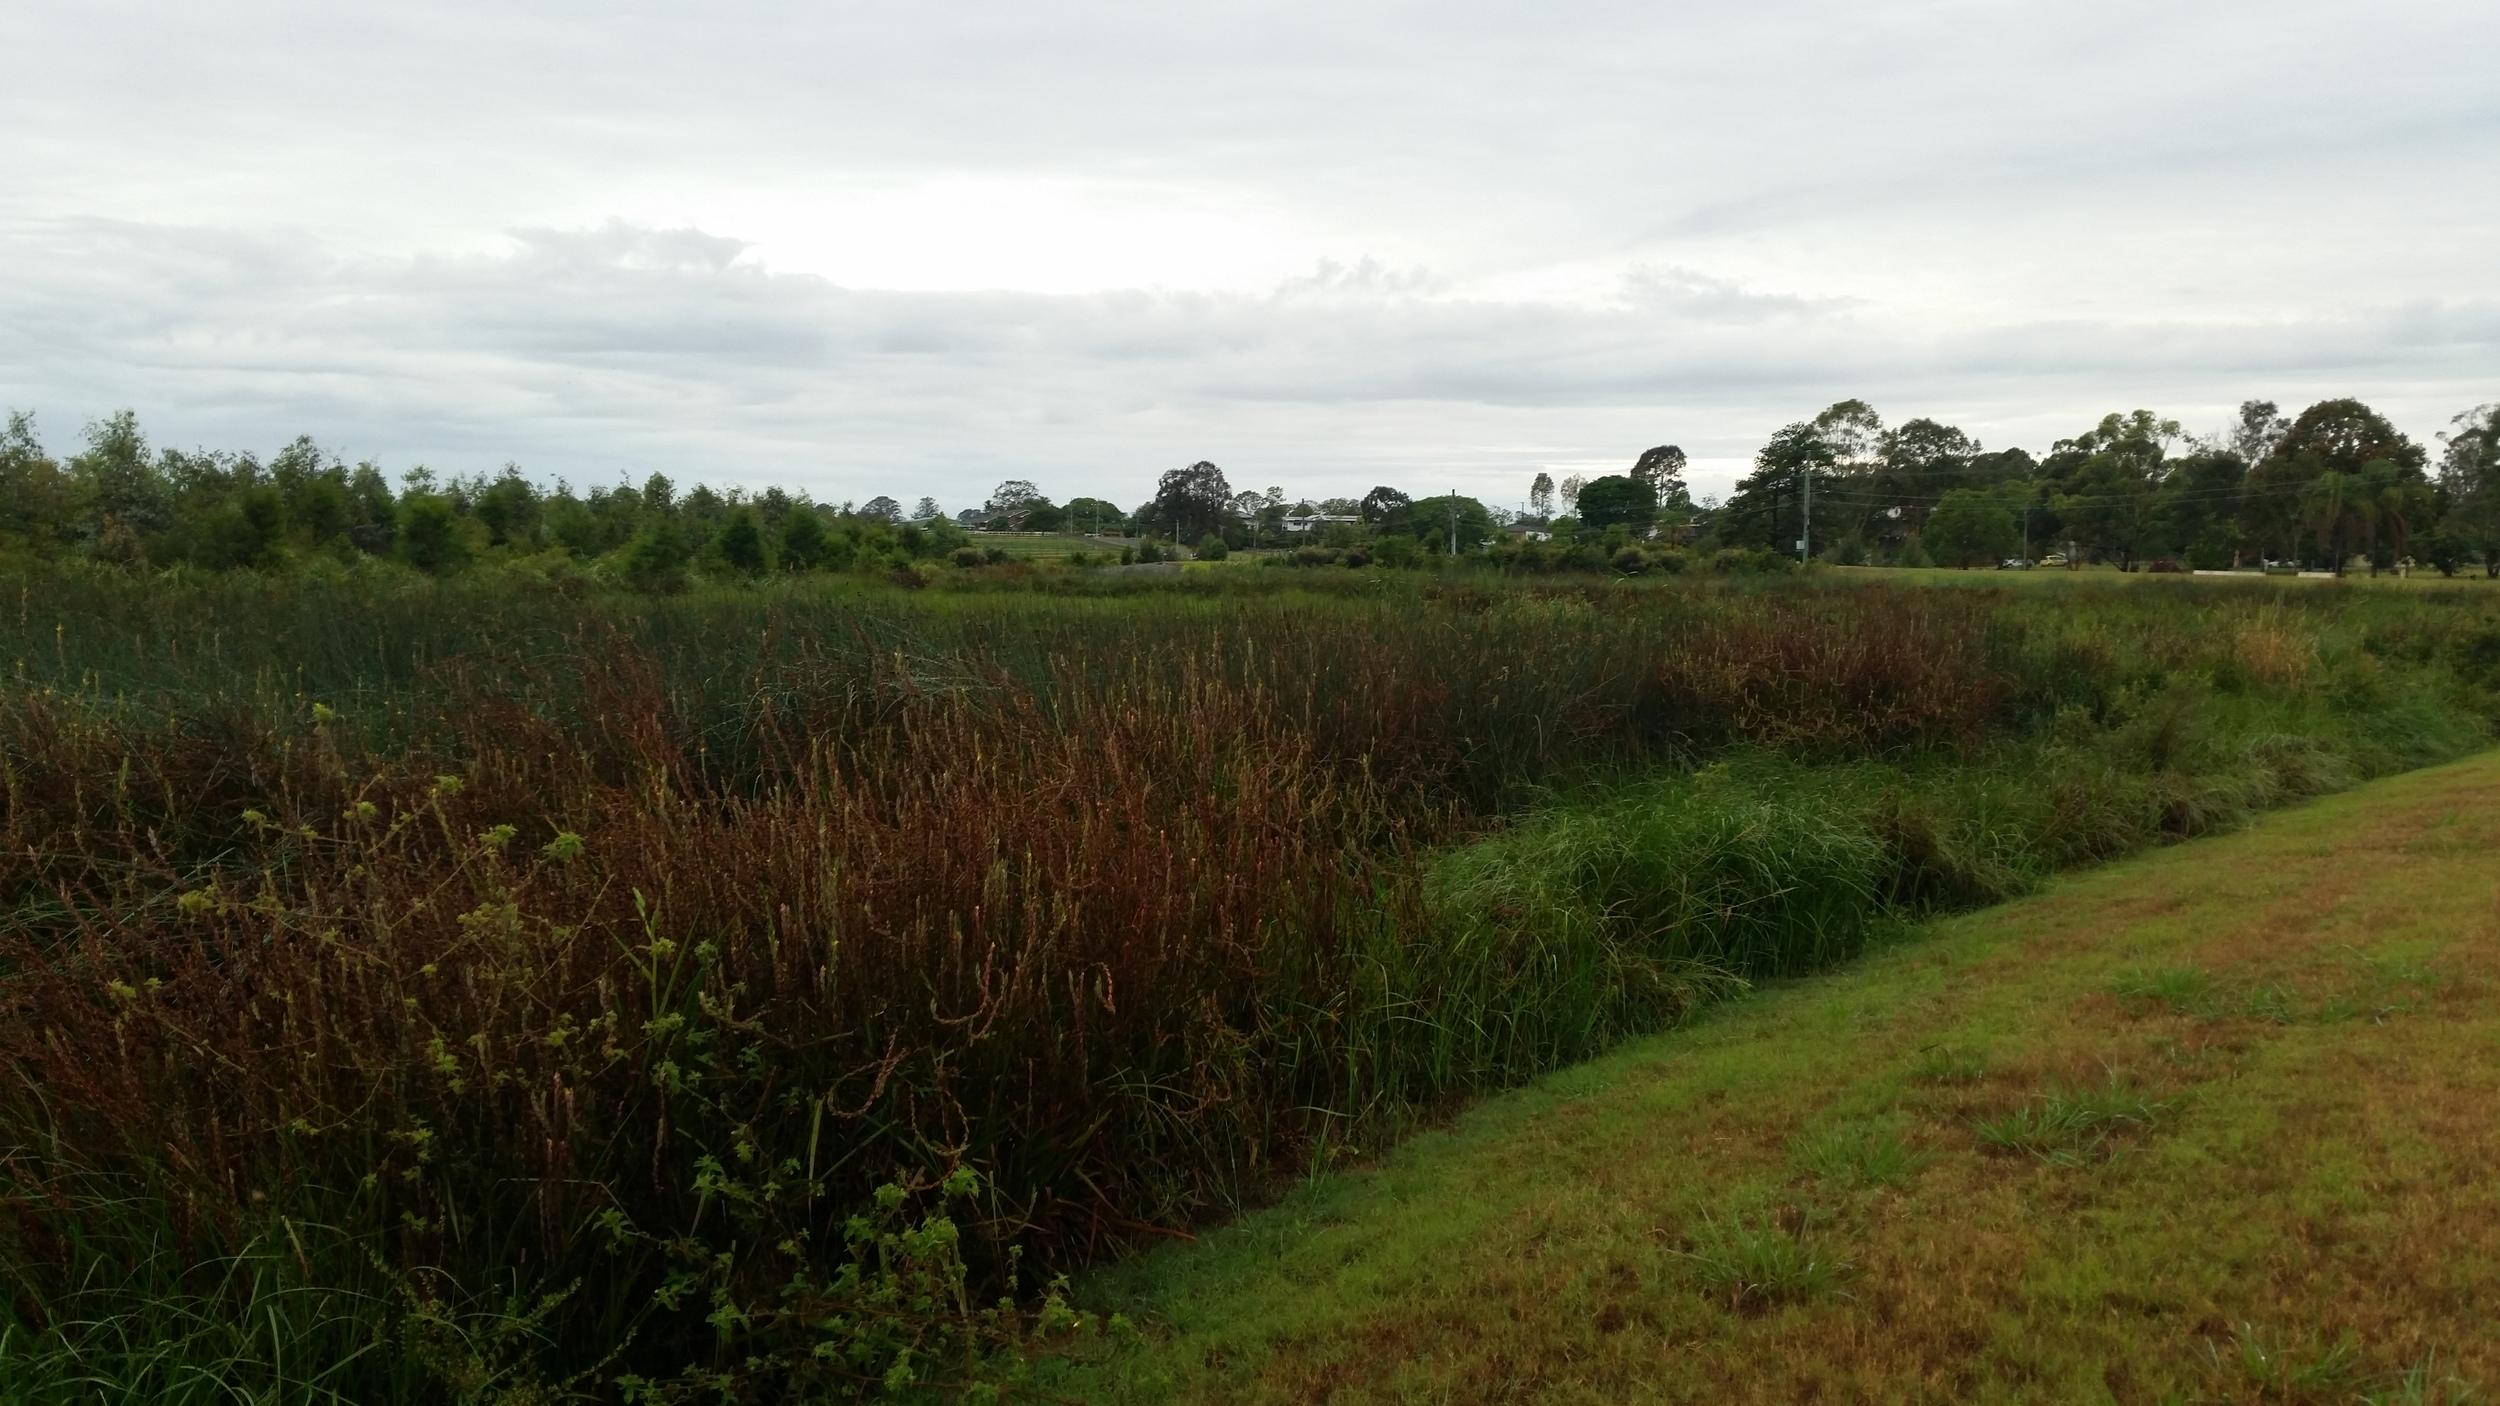 Loganlea Road Wetland